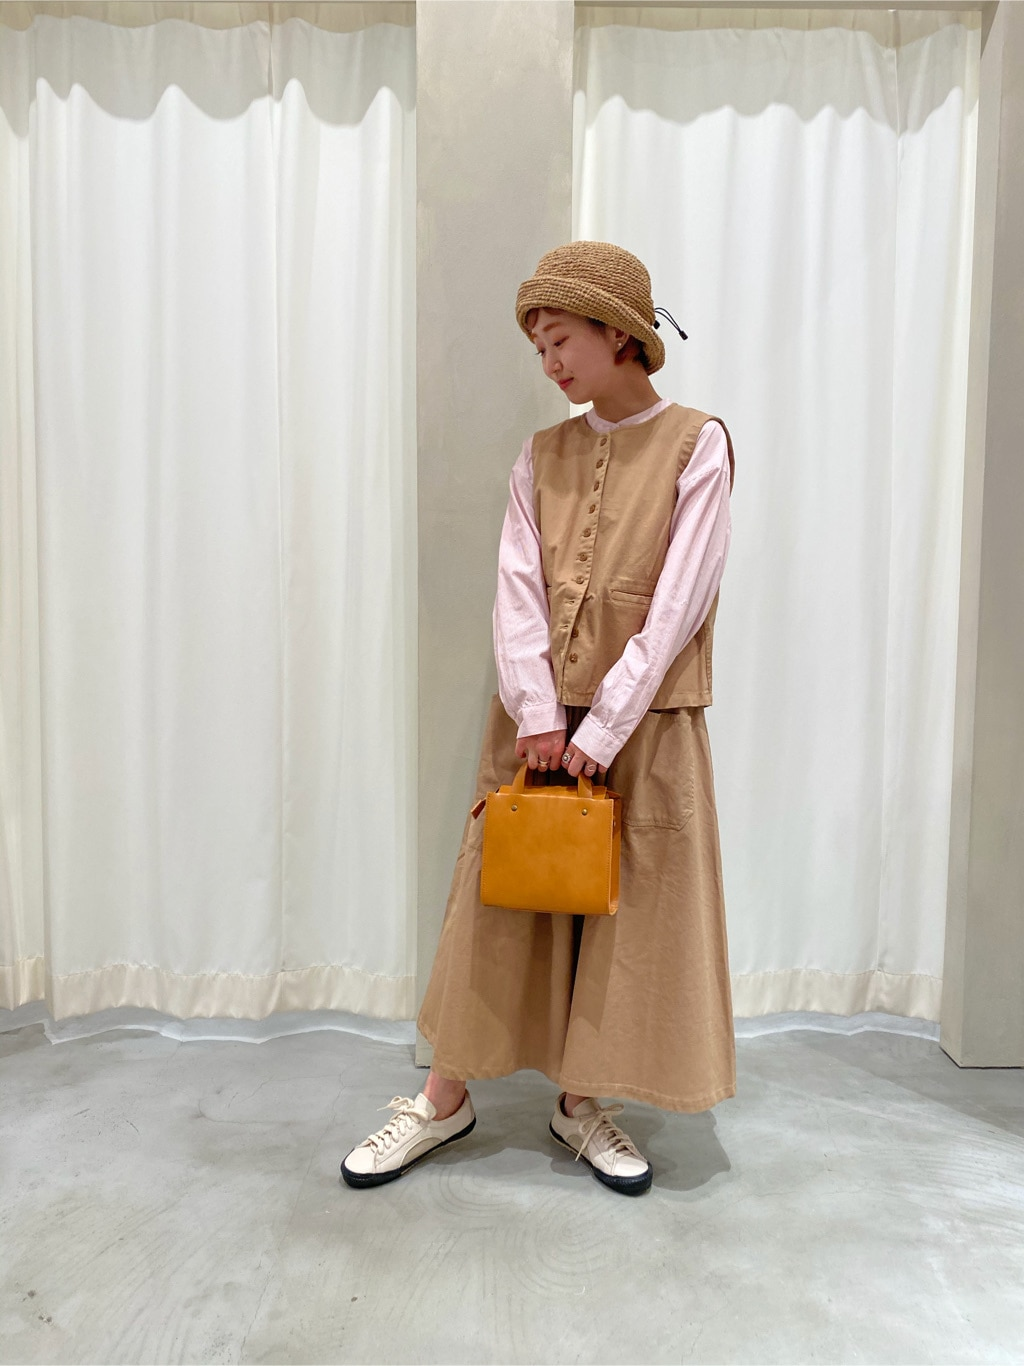 - CHILD WOMAN CHILD WOMAN , PAR ICI 東京スカイツリータウン・ソラマチ 身長:150cm 2021.05.11